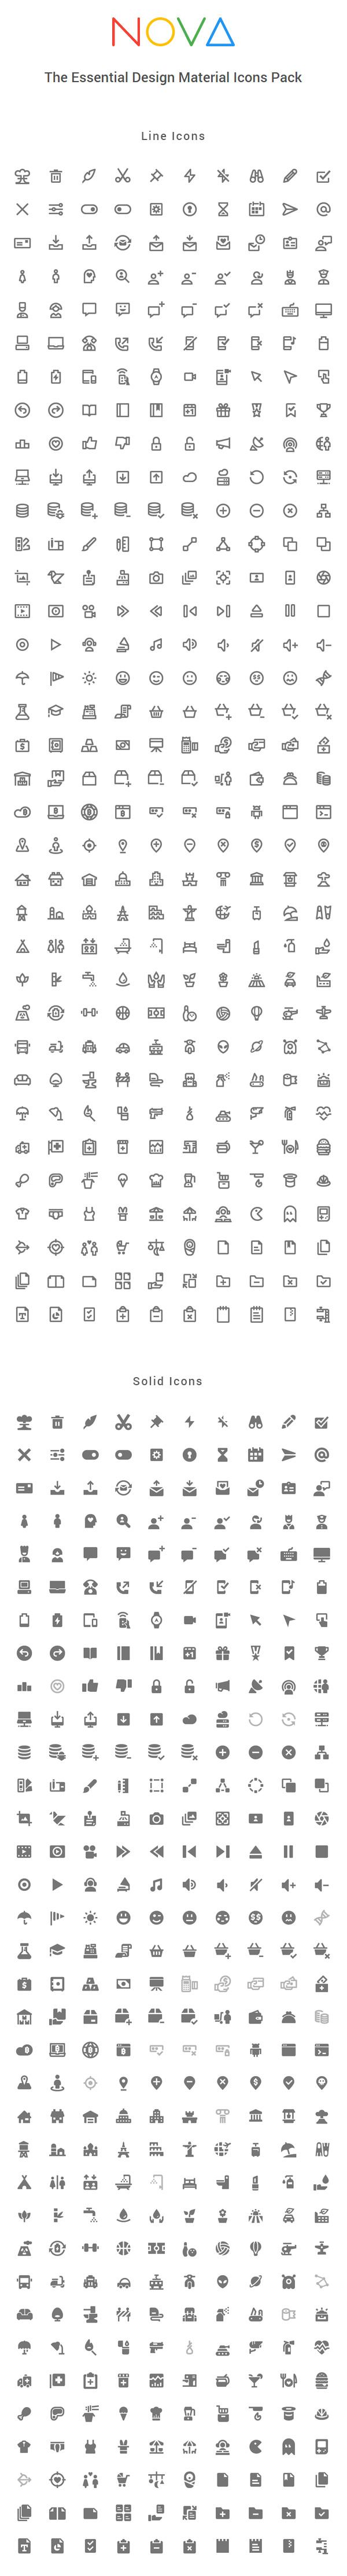 nova-icons-600